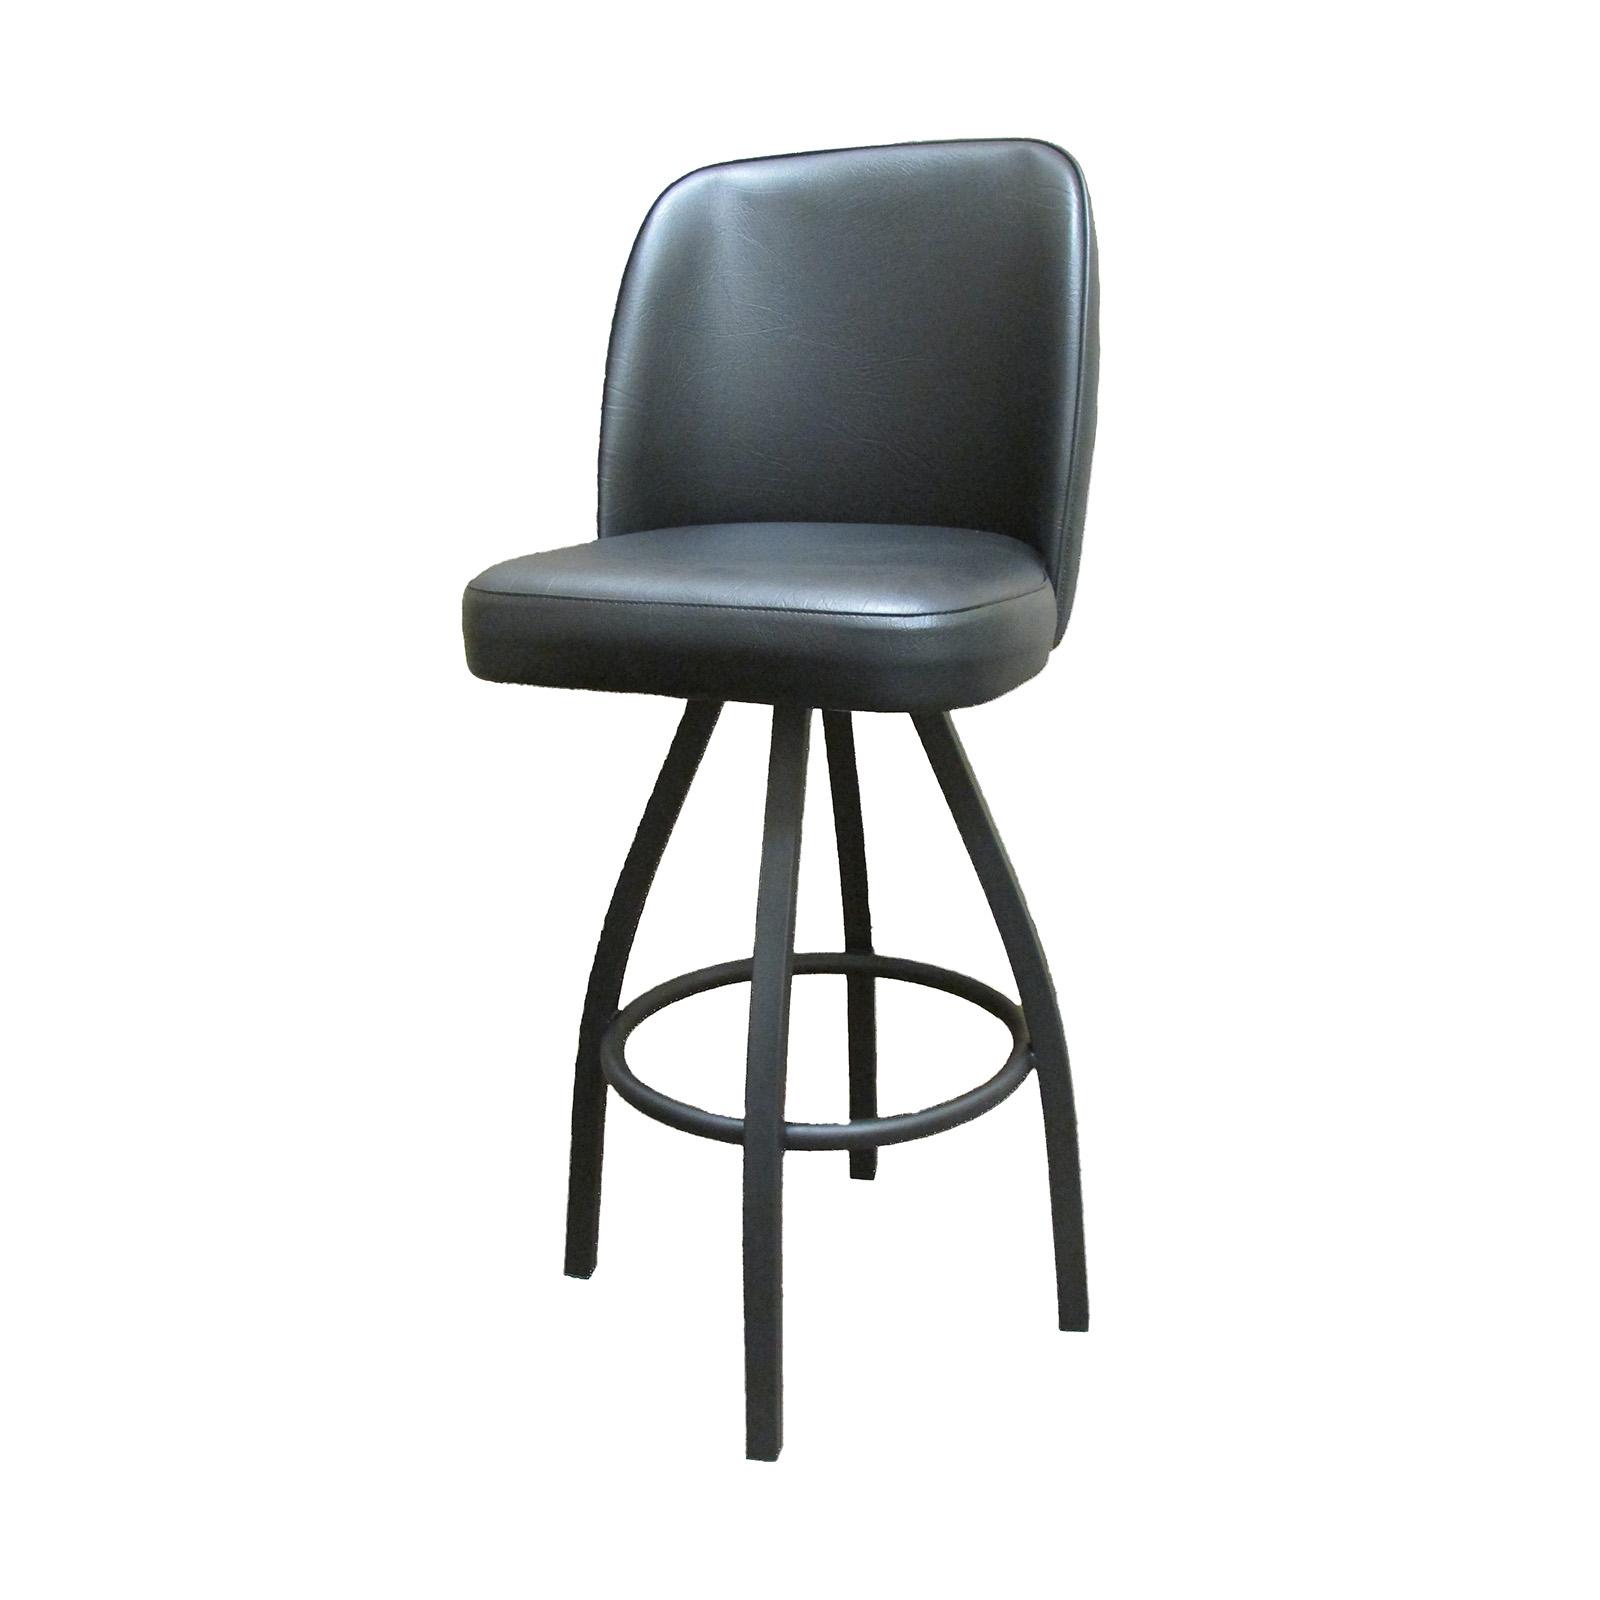 Oak Street SL0136-WINE bar stool, swivel, indoor